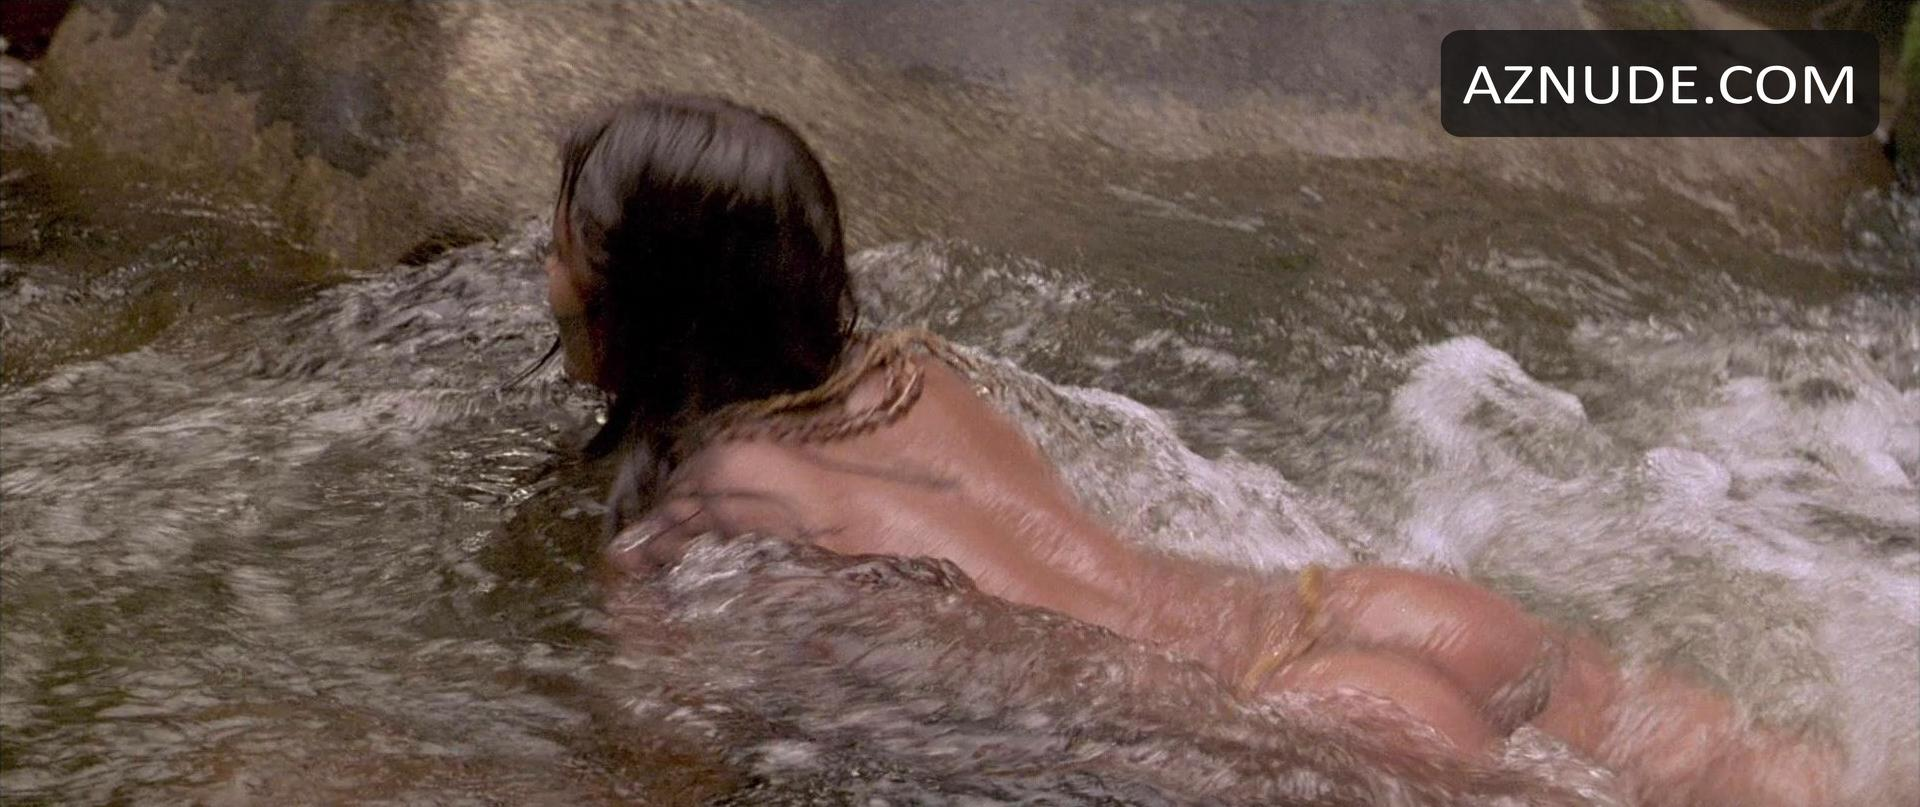 The Emerald Forest Nude Scenes - Aznude-3289